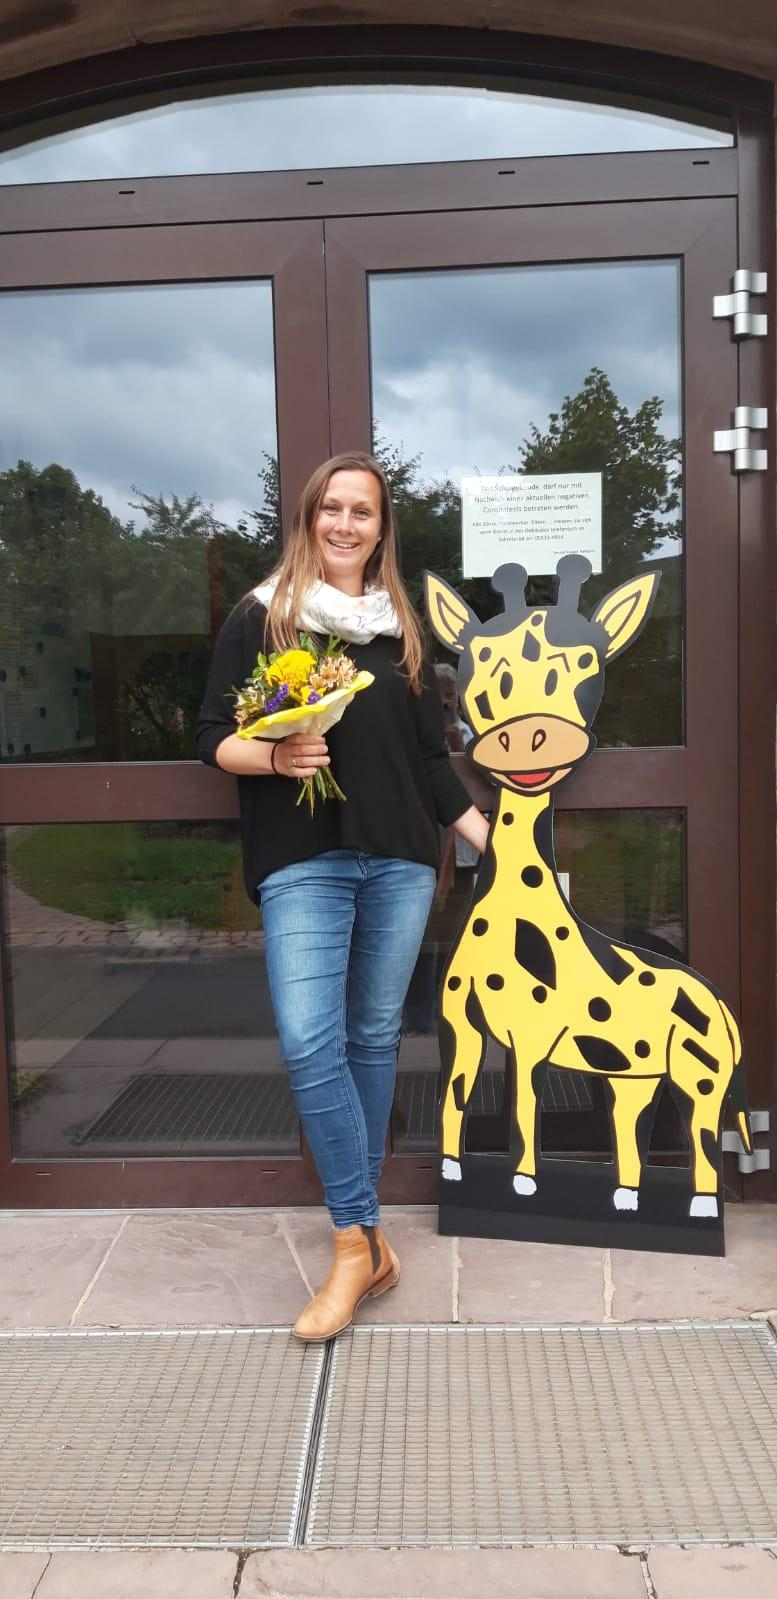 Katharina Feulner